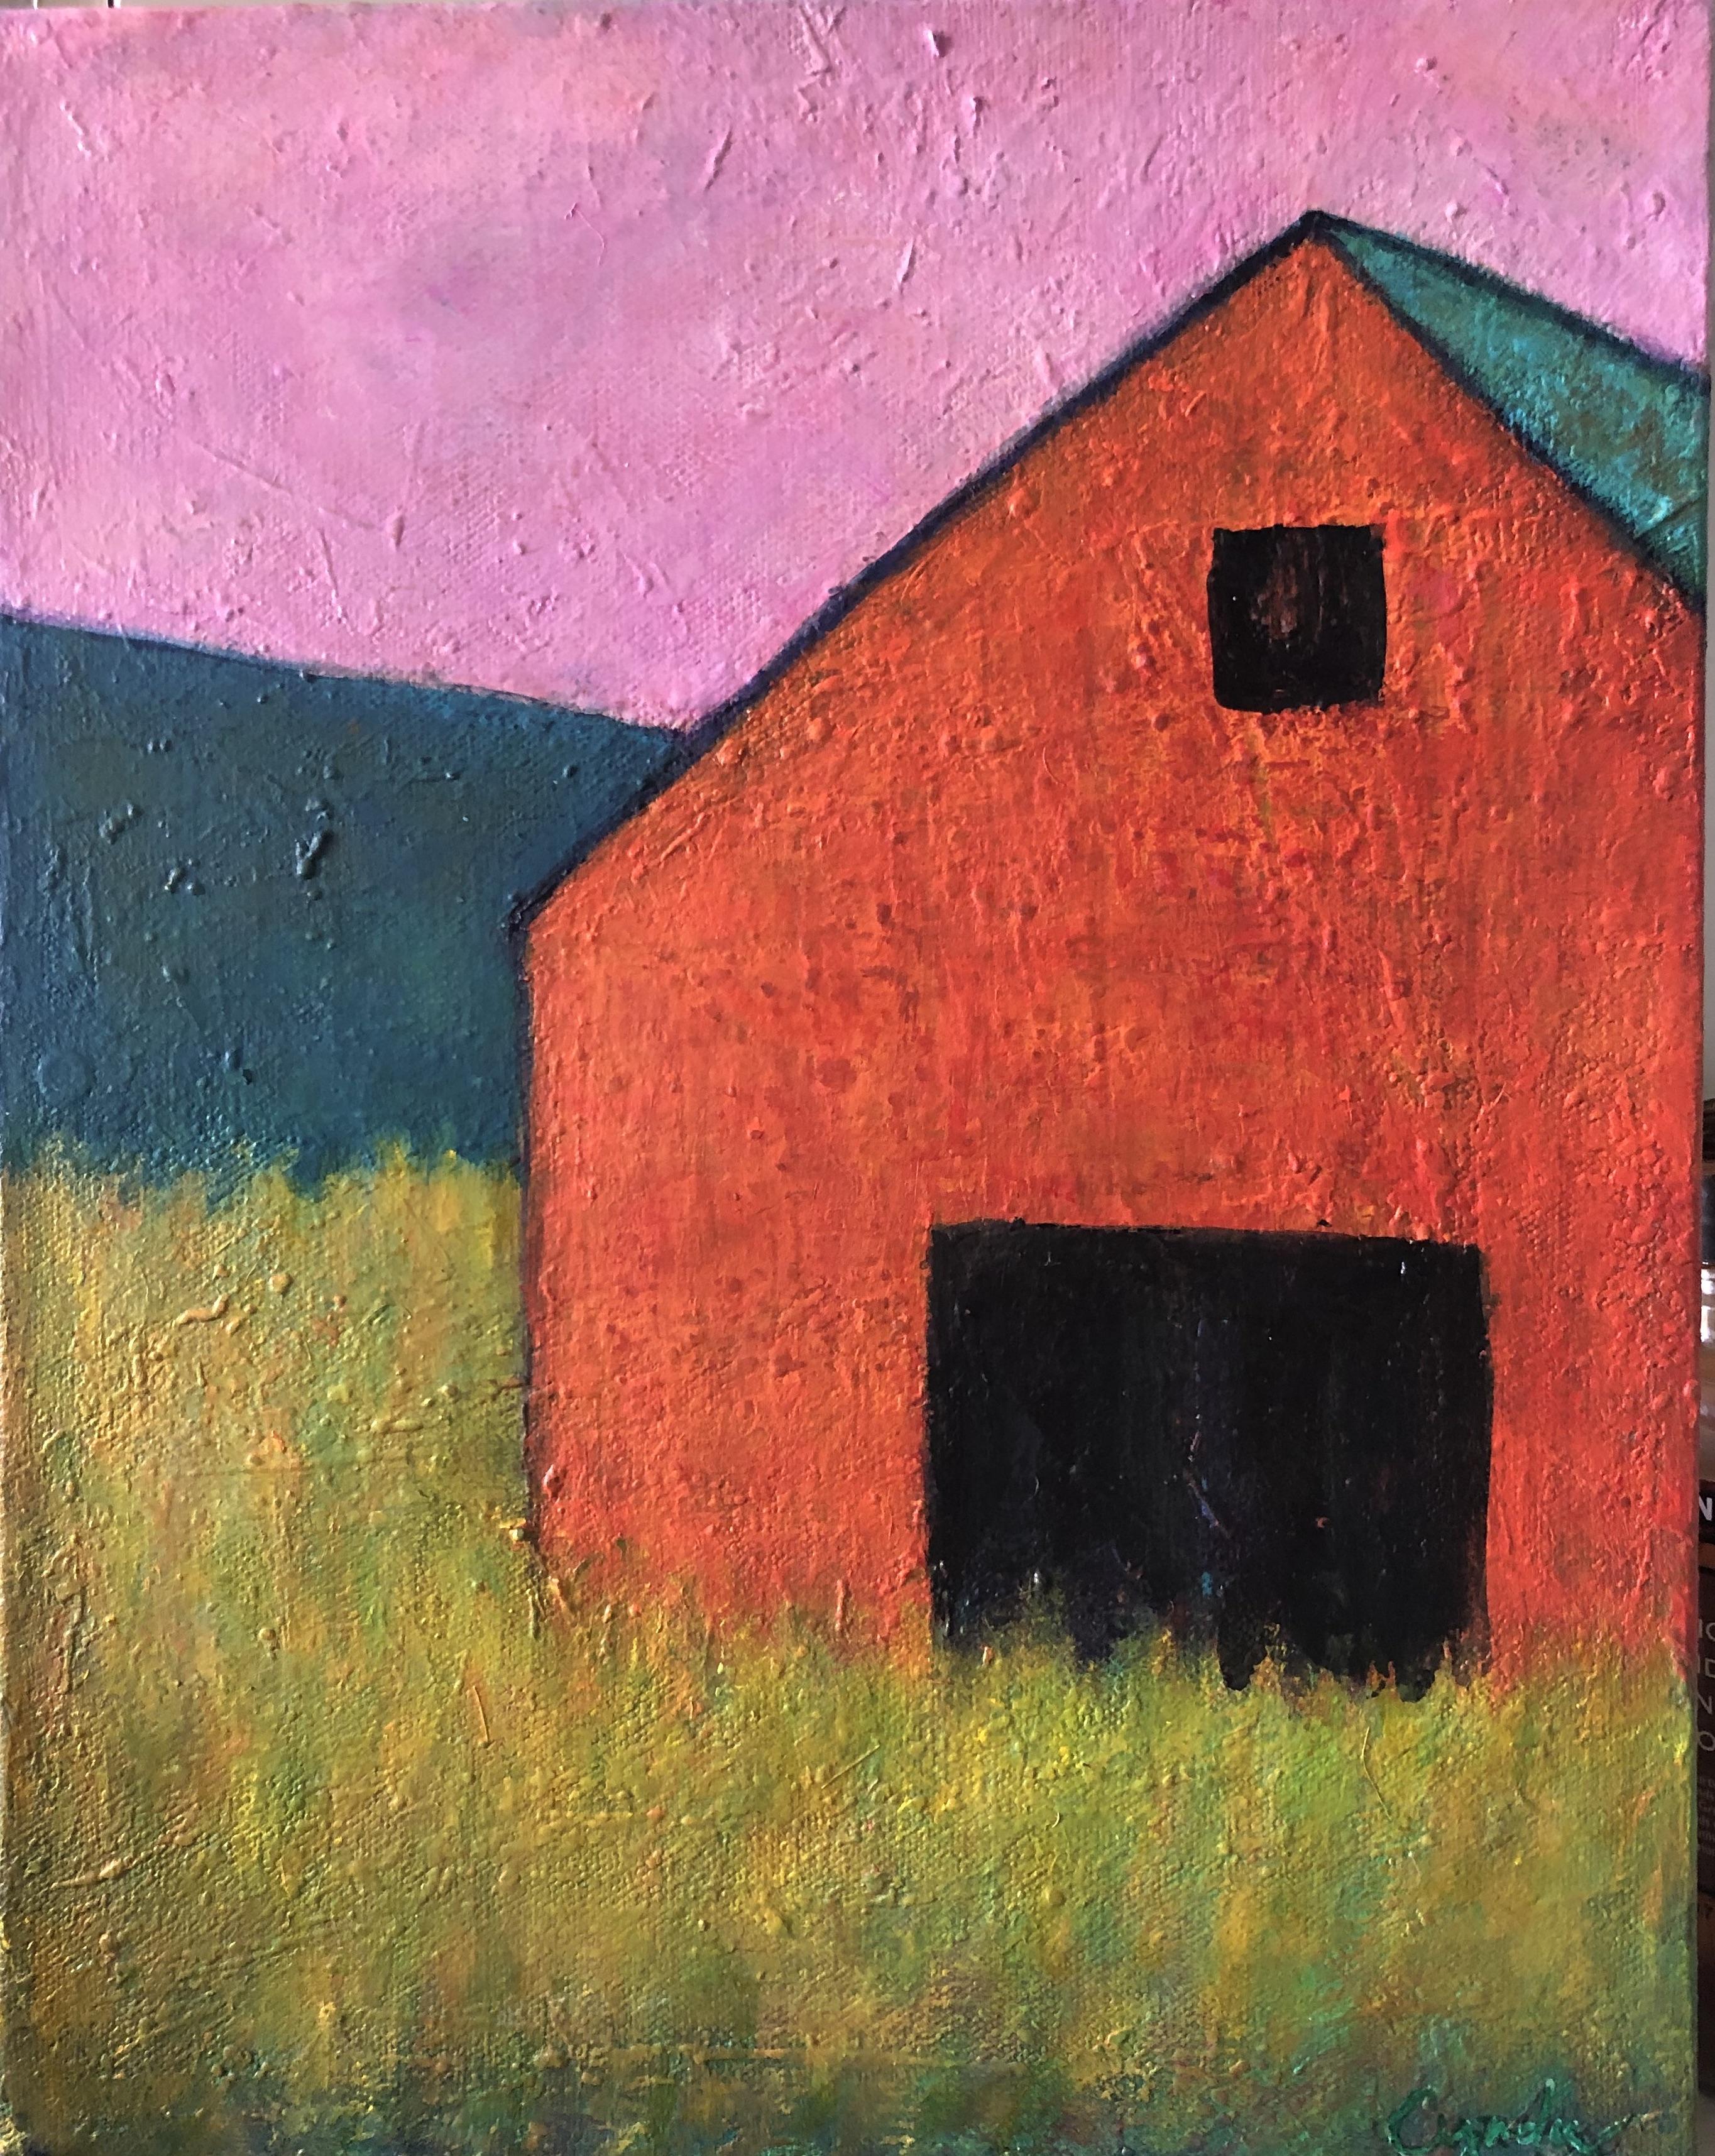 Orange Barn, Pink Sky   9 x 12  Acrylic